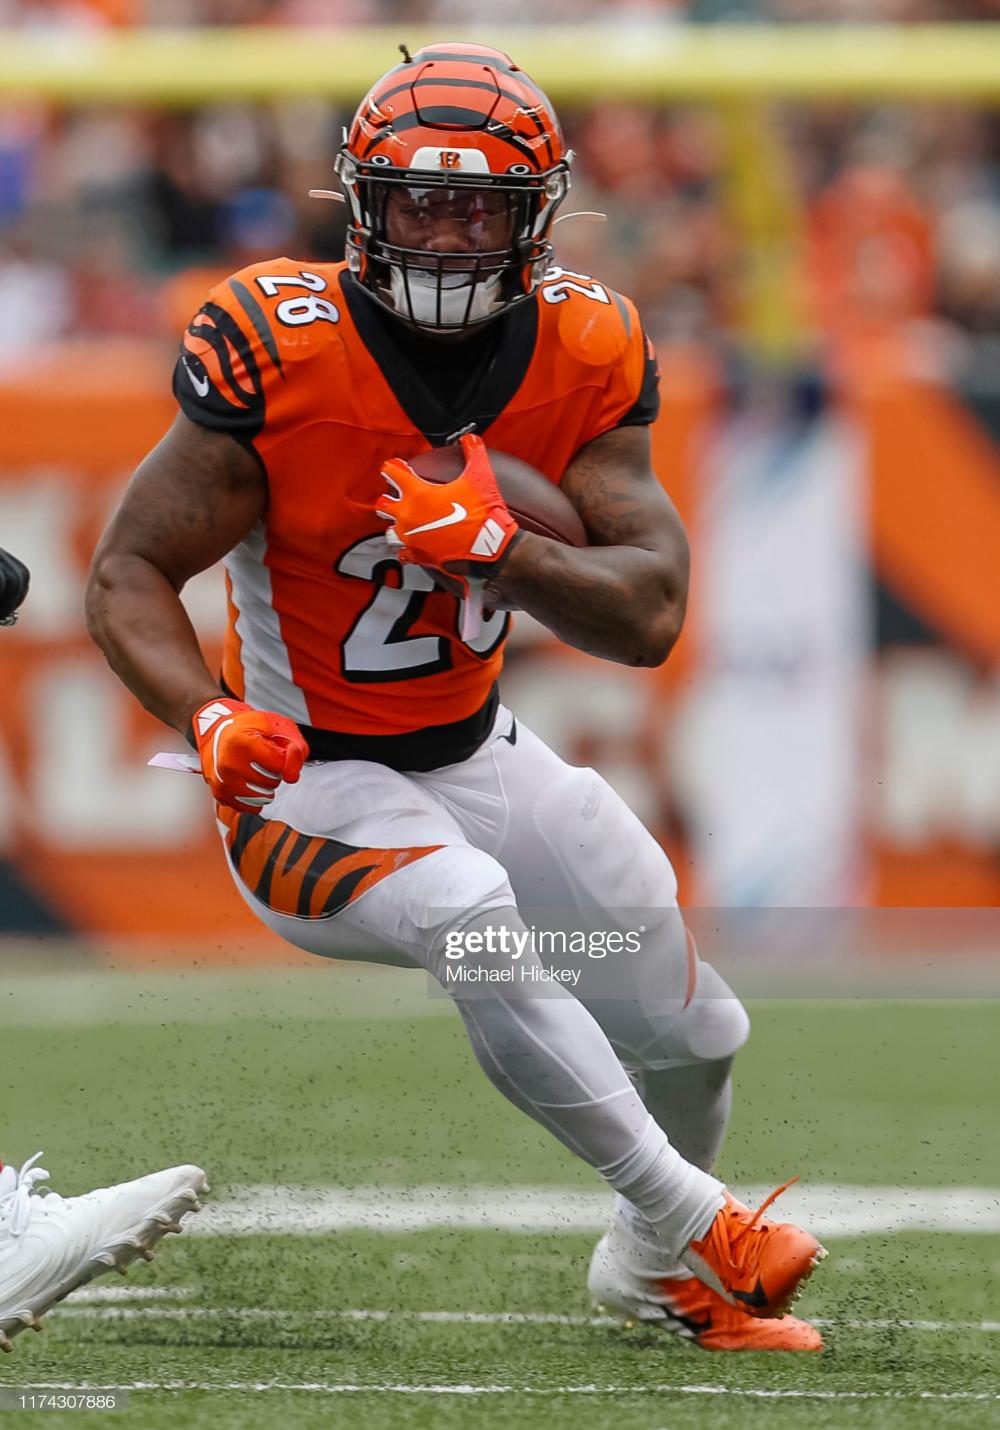 Joe Mixon of the Cincinnati Bengals runs the ball during